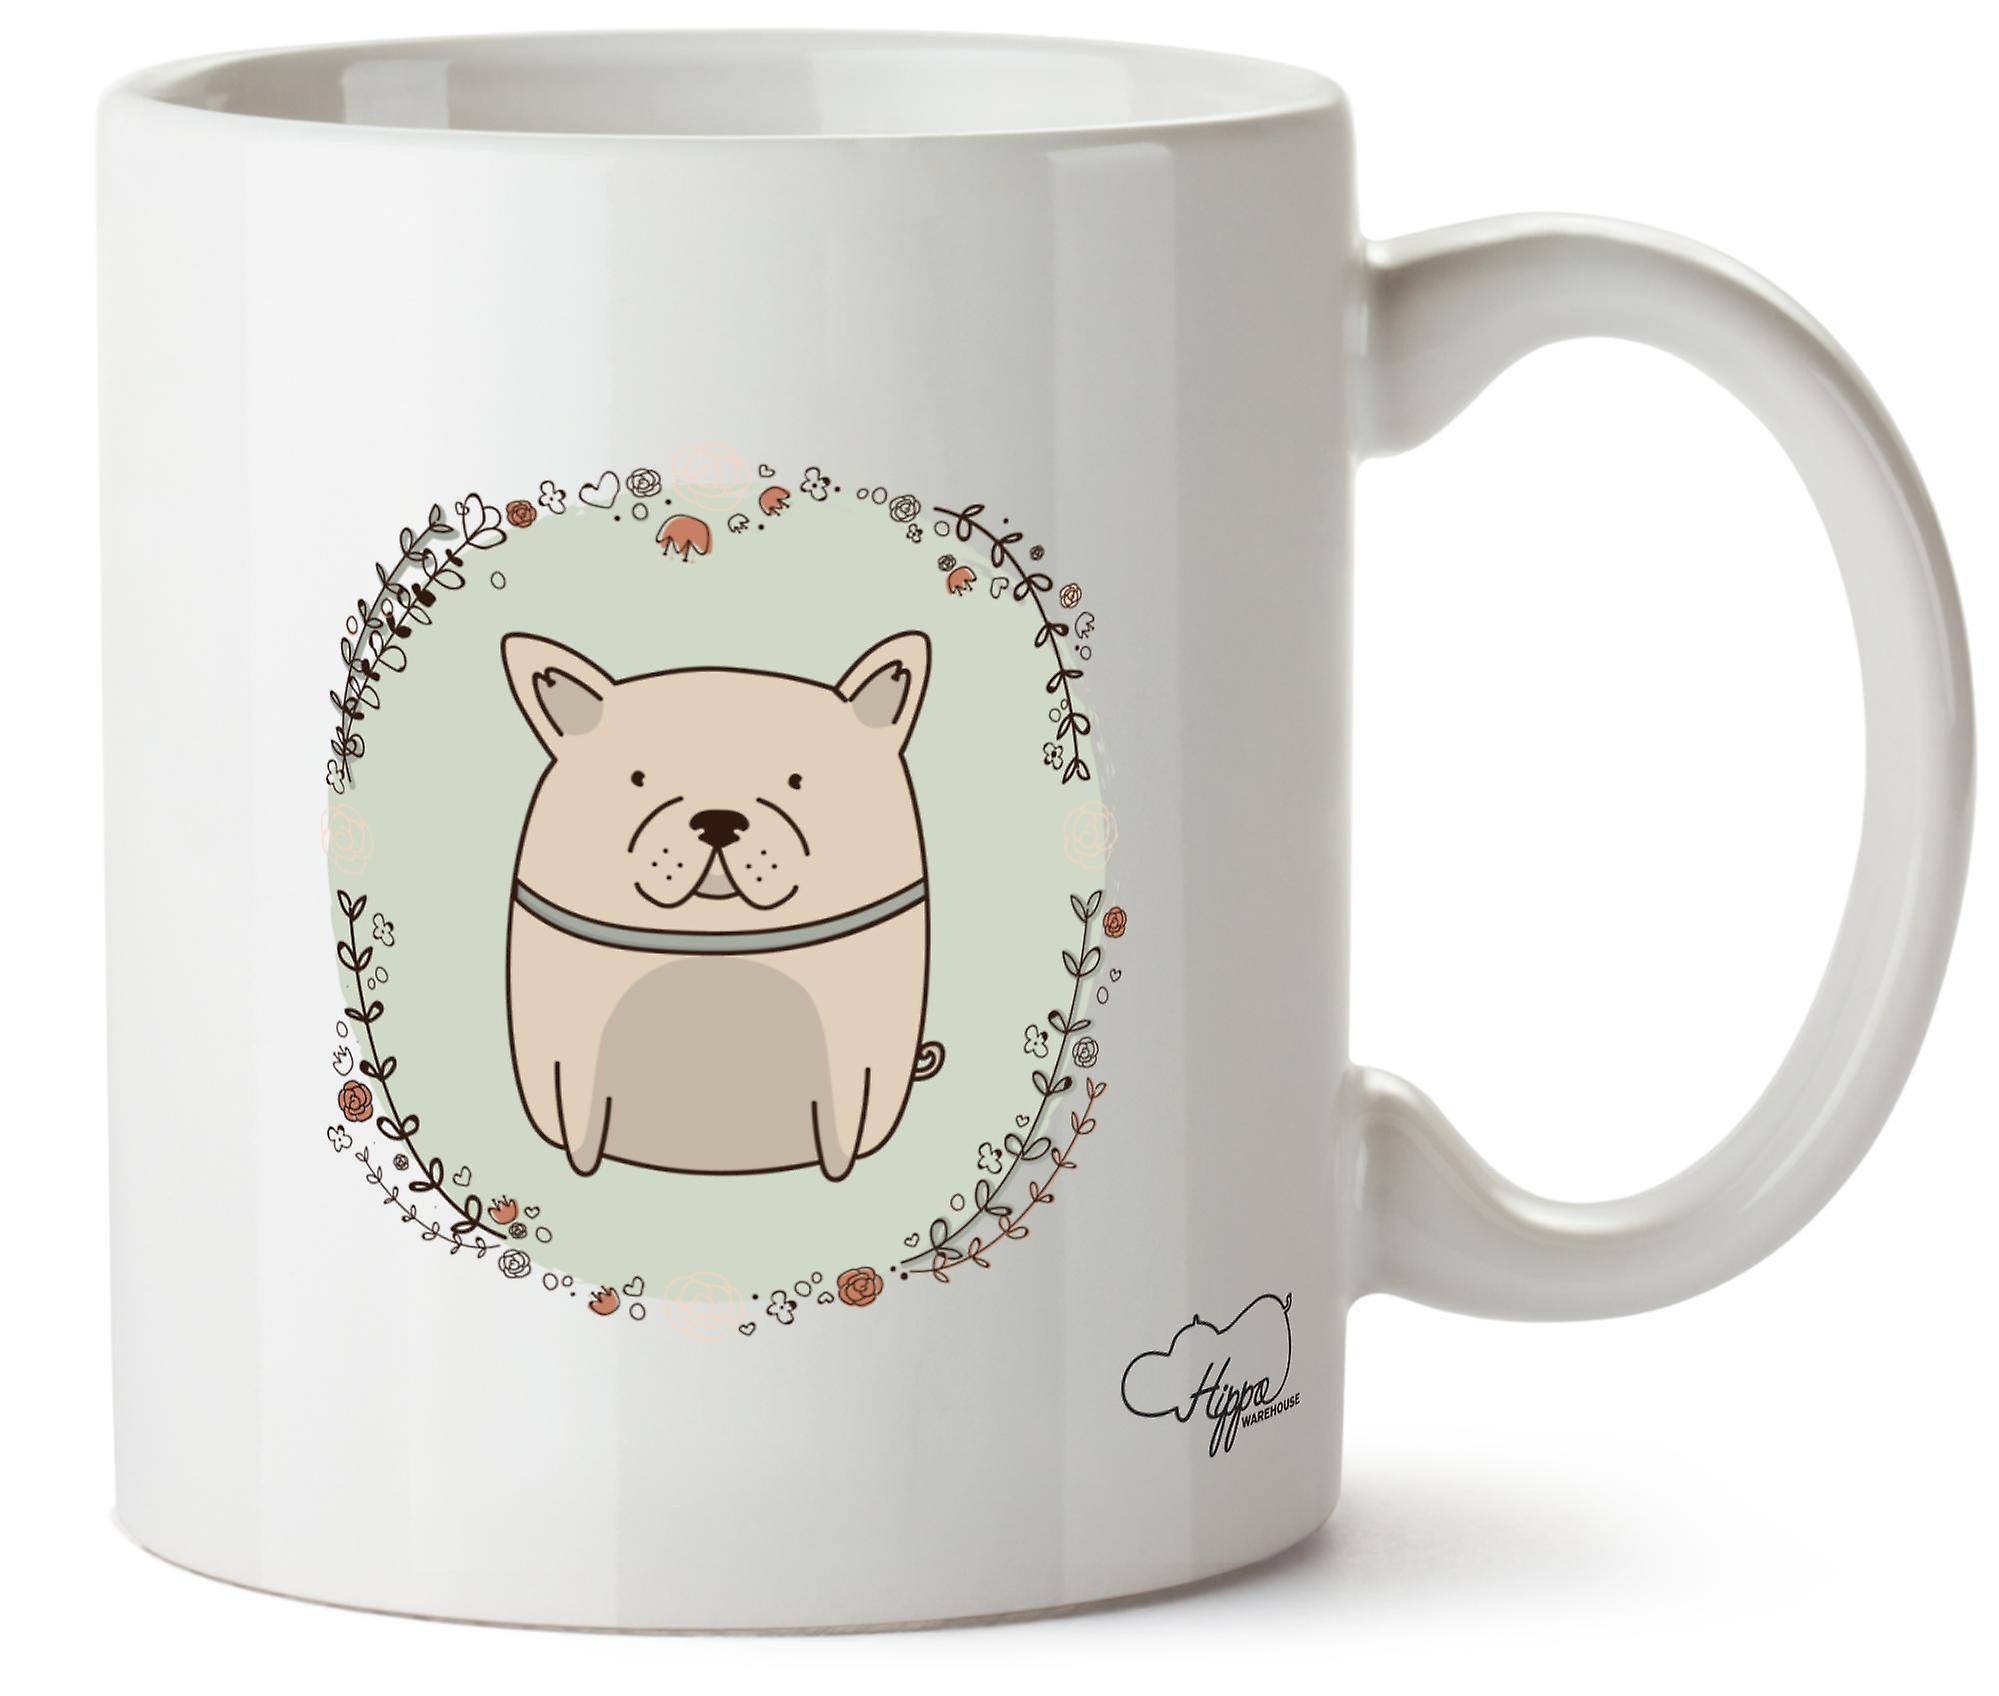 Hippowarehouse Cute Frenchie Dog Printed Mug Cup Ceramic 10oz